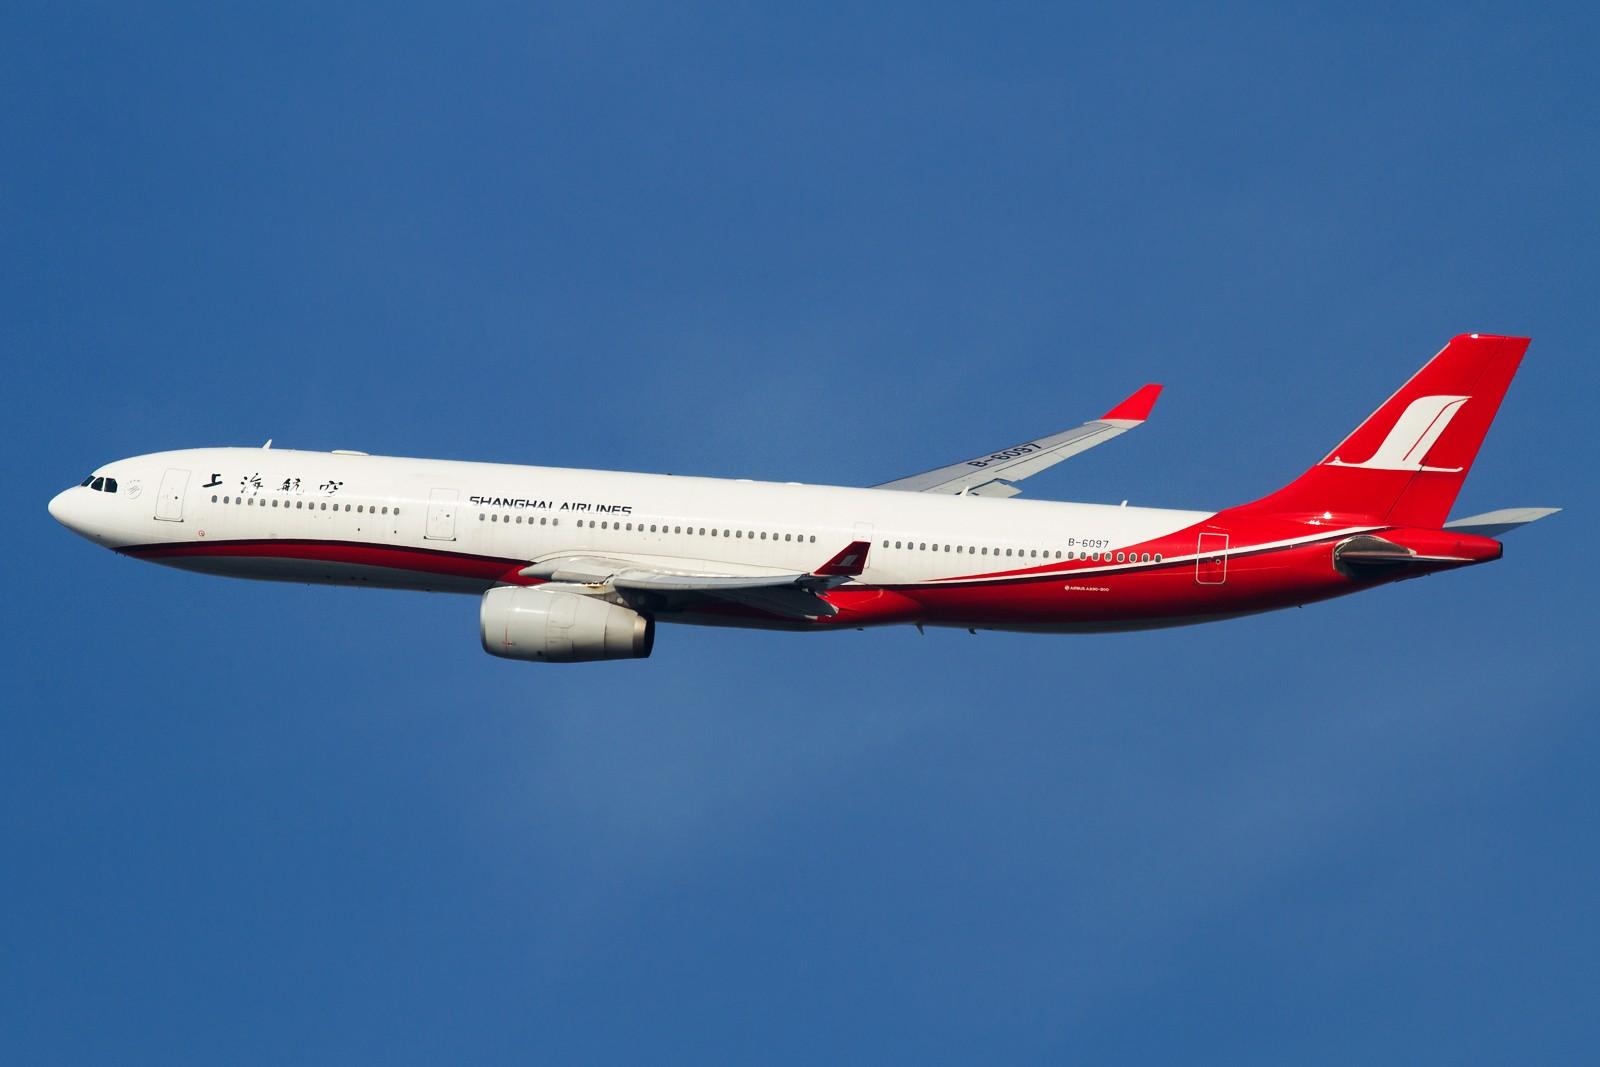 Re:[原创]【SHA/PVG/NKG/HKG/PEK】***********2014年度总结*********** AIRBUS A330-300 B-6097 中国上海虹桥国际机场